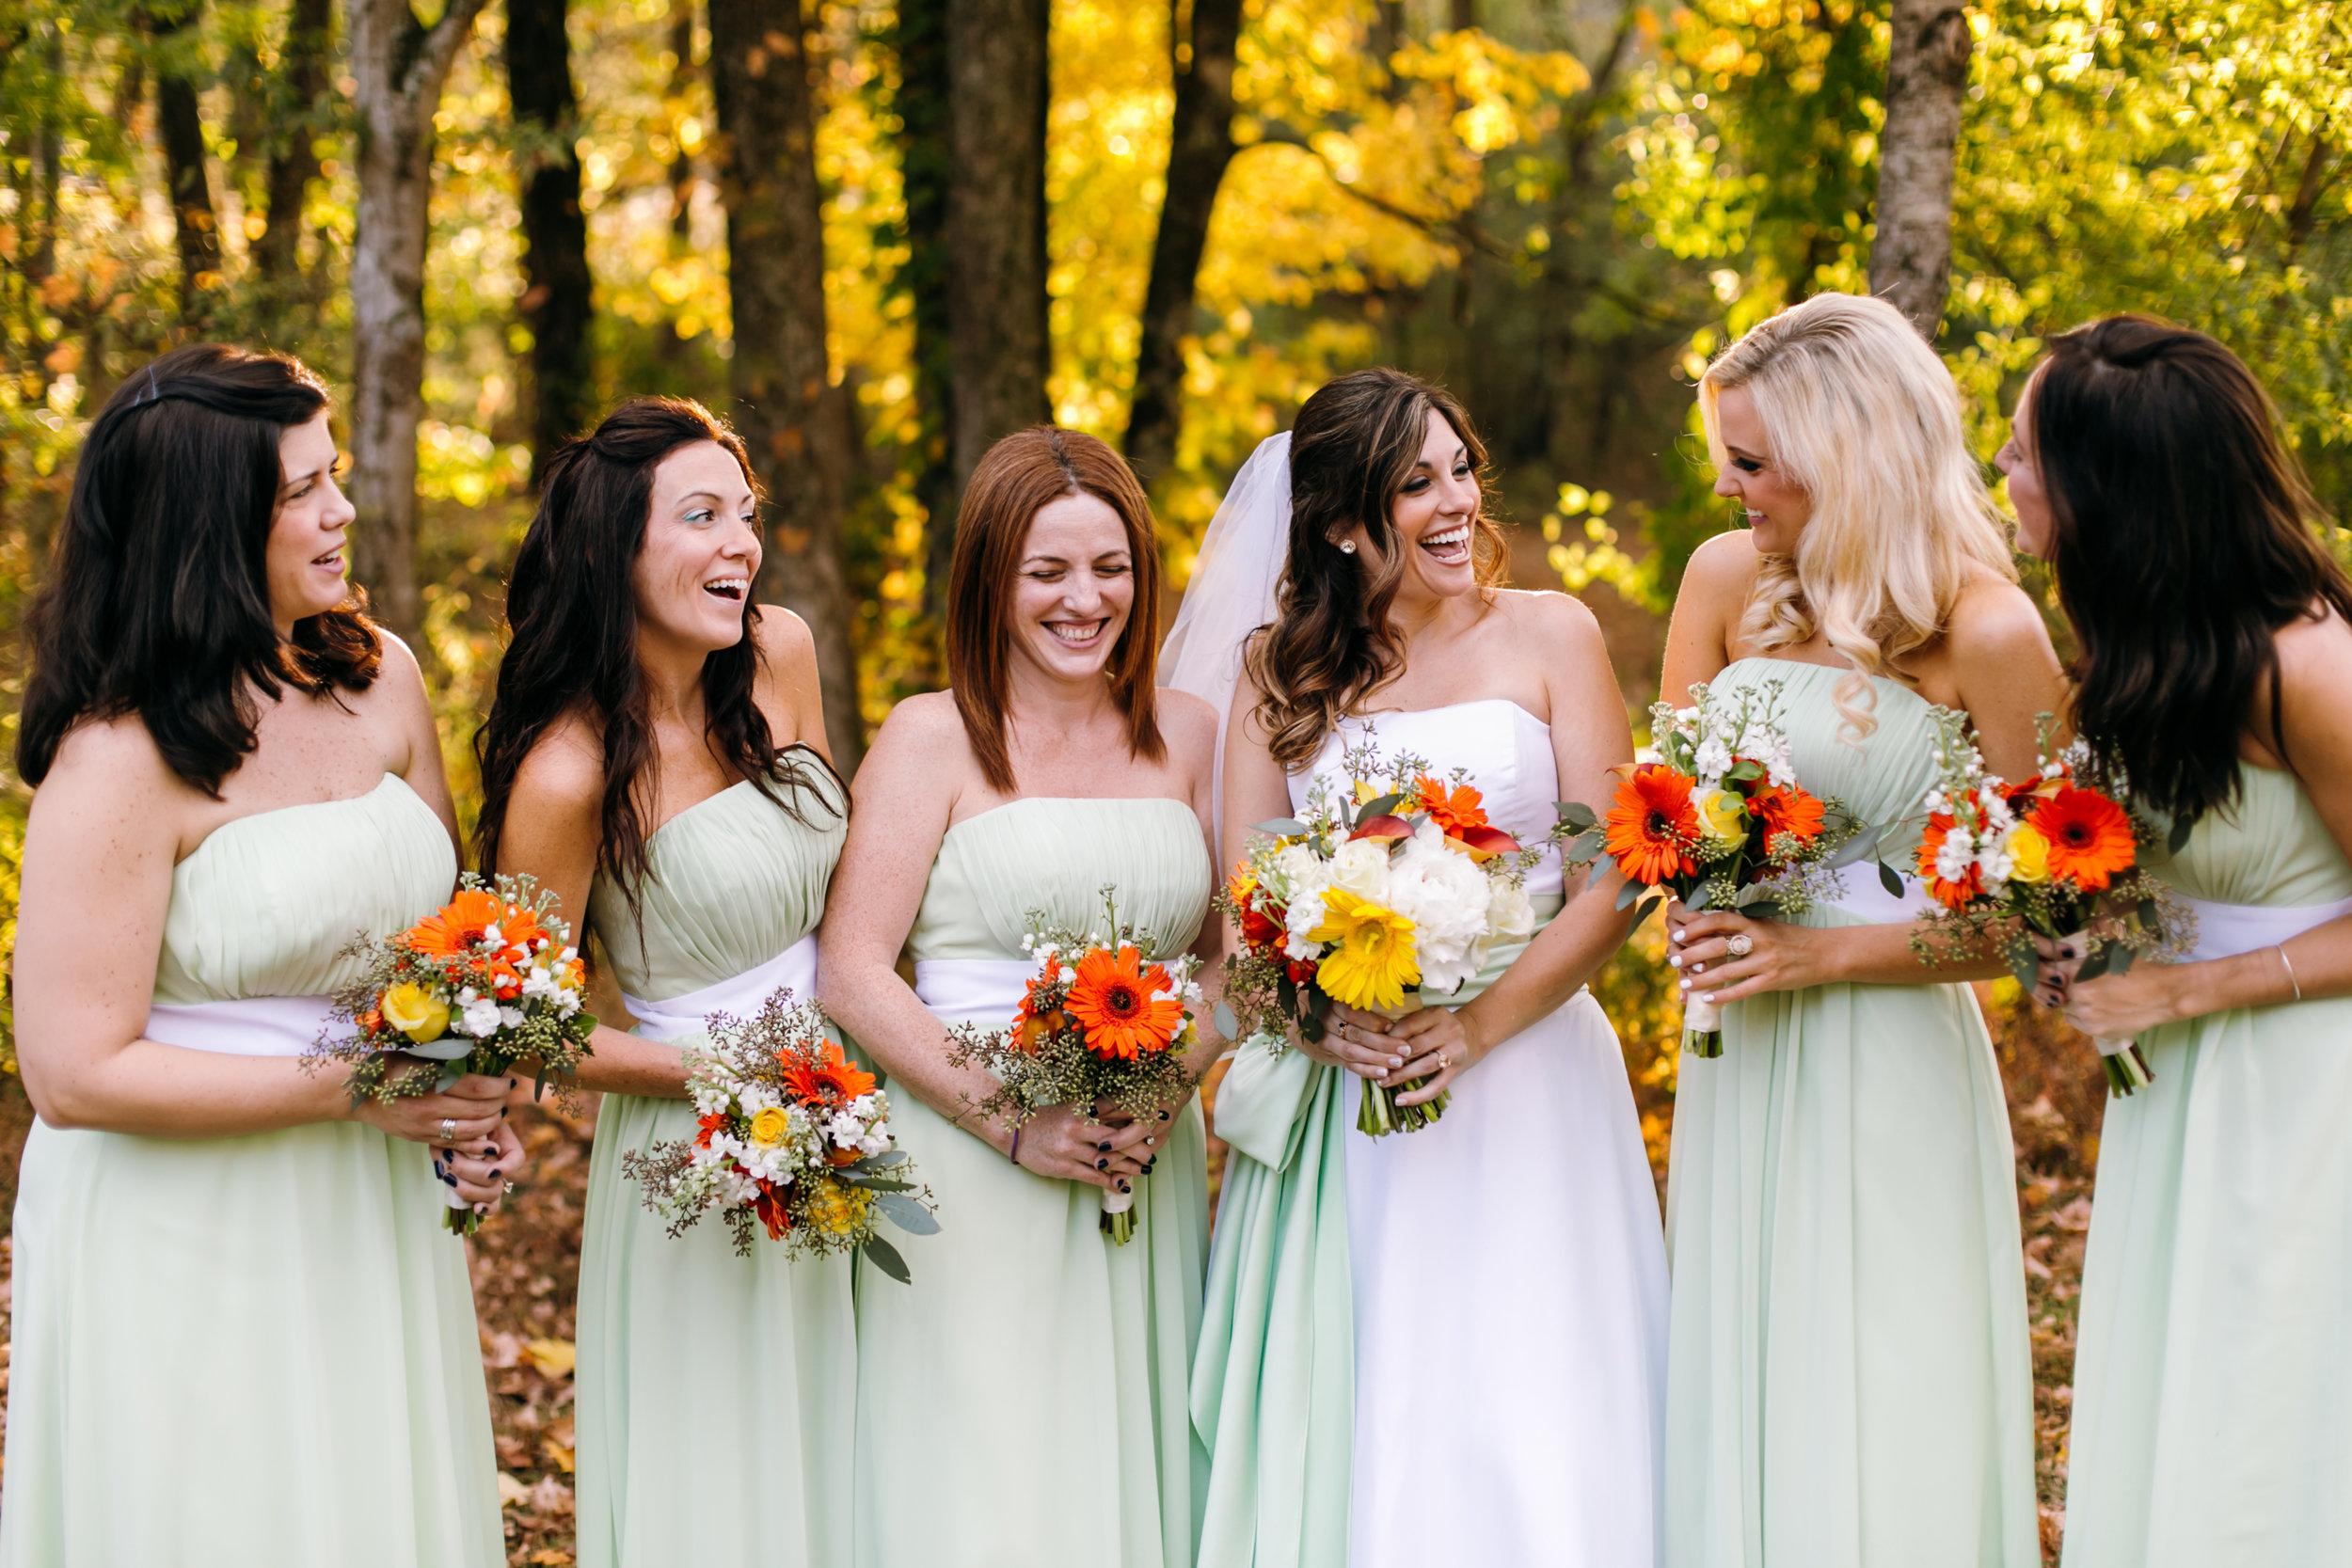 KaraNixonWeddings-Nashville-TN-Wedding-16.jpg